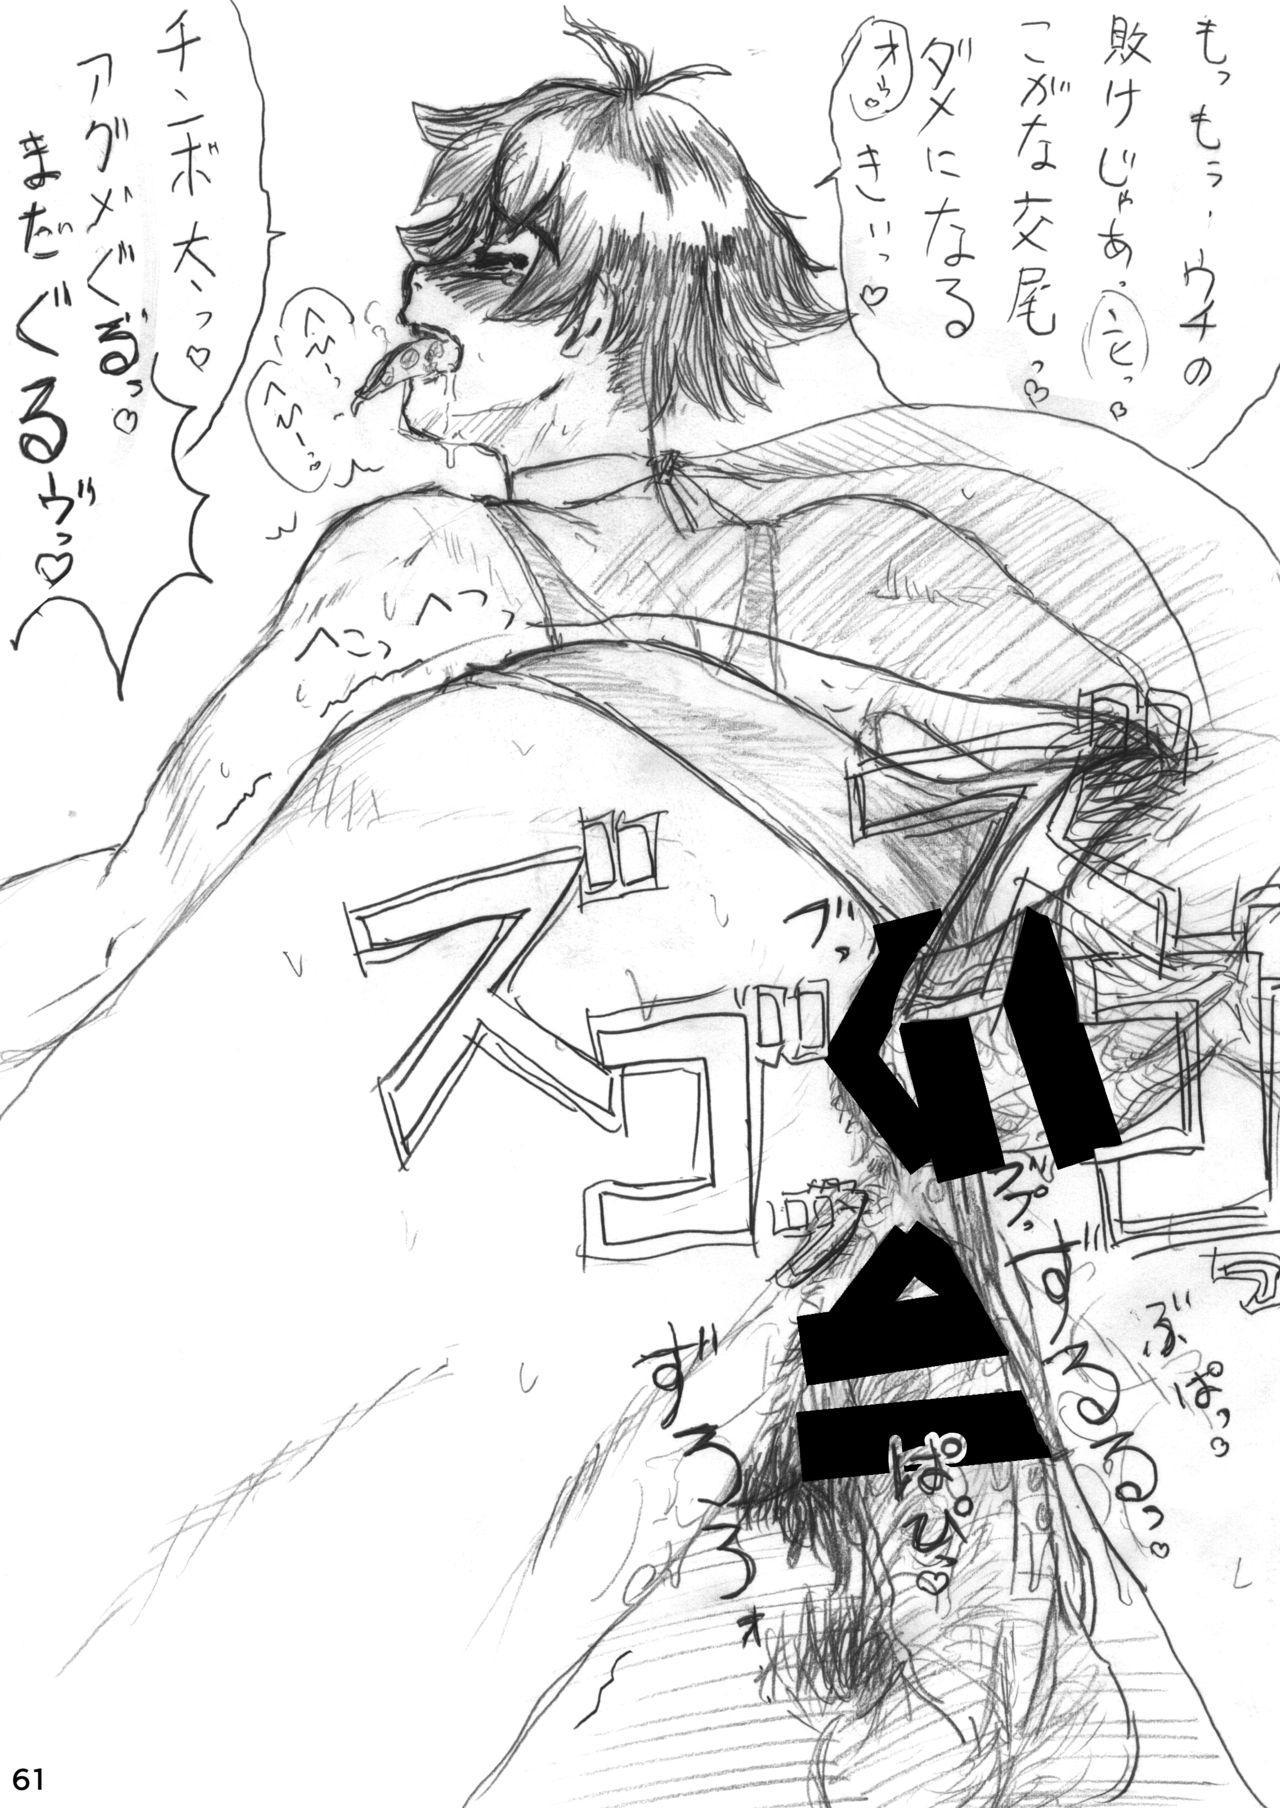 CA〇COM(&MORE!) VS FIGHTING GIRLS Swimsuit&Gangbang Special 59